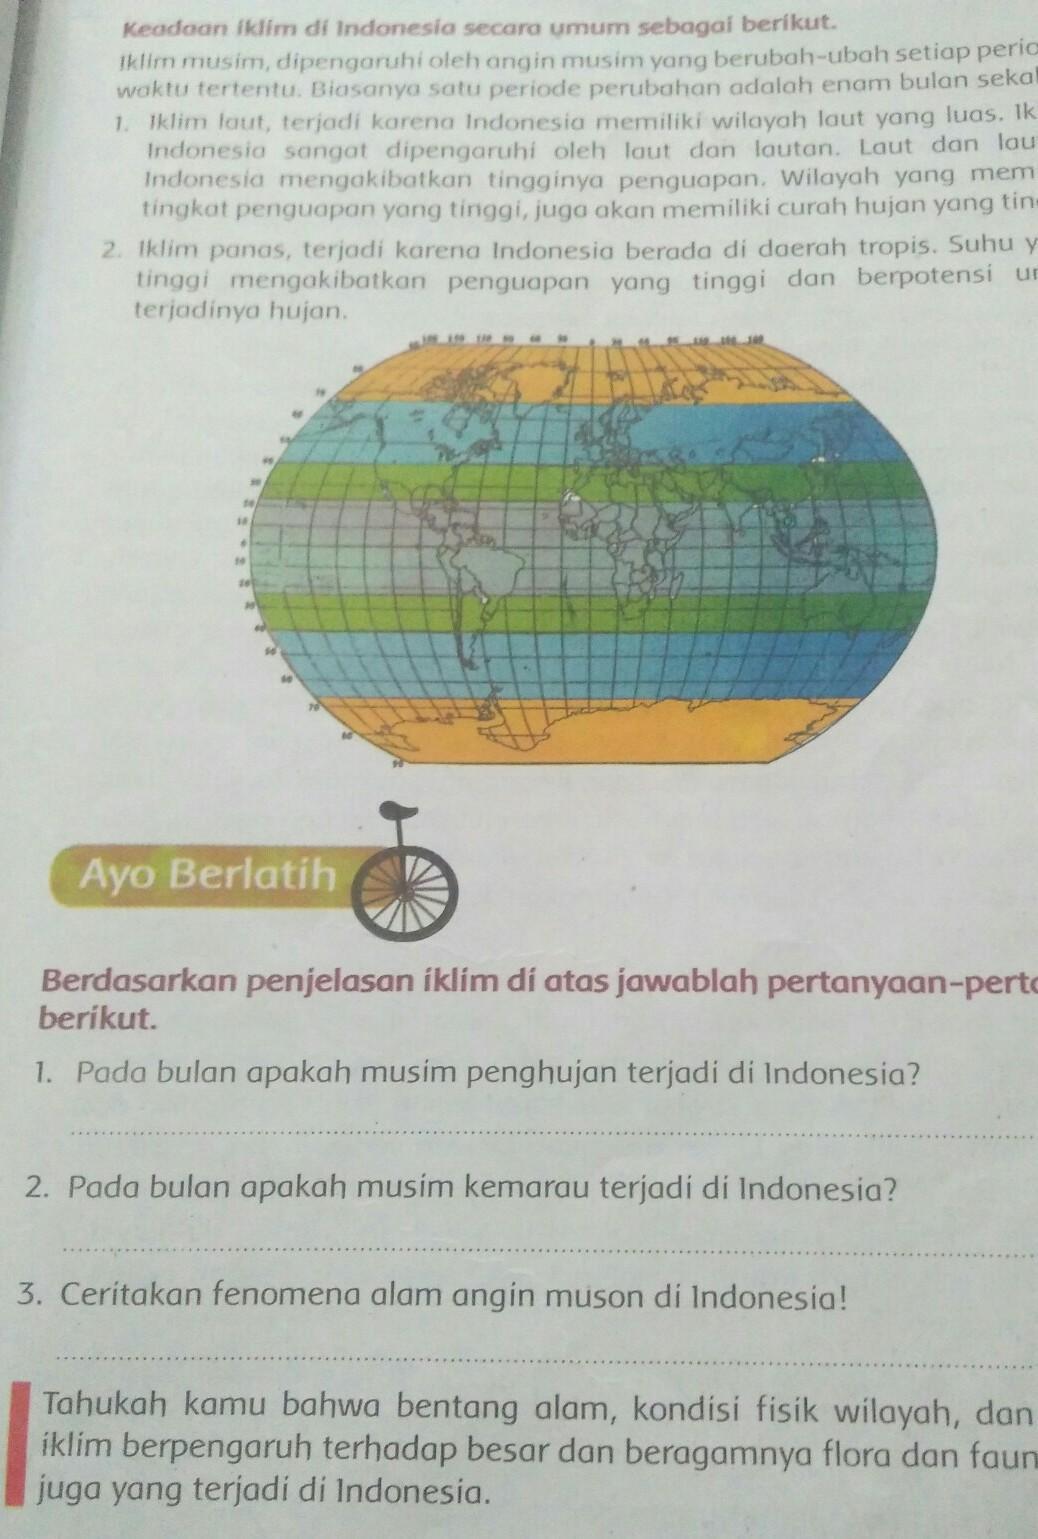 Pada Bulan Apakah Musim Penghujan Terjadi Di Indonesia : bulan, apakah, musim, penghujan, terjadi, indonesia, Jawab, Tugas, Kerjain, Pukul, 12.00, Plisssss, Jawabb, Lumayan, Brainly.co.id